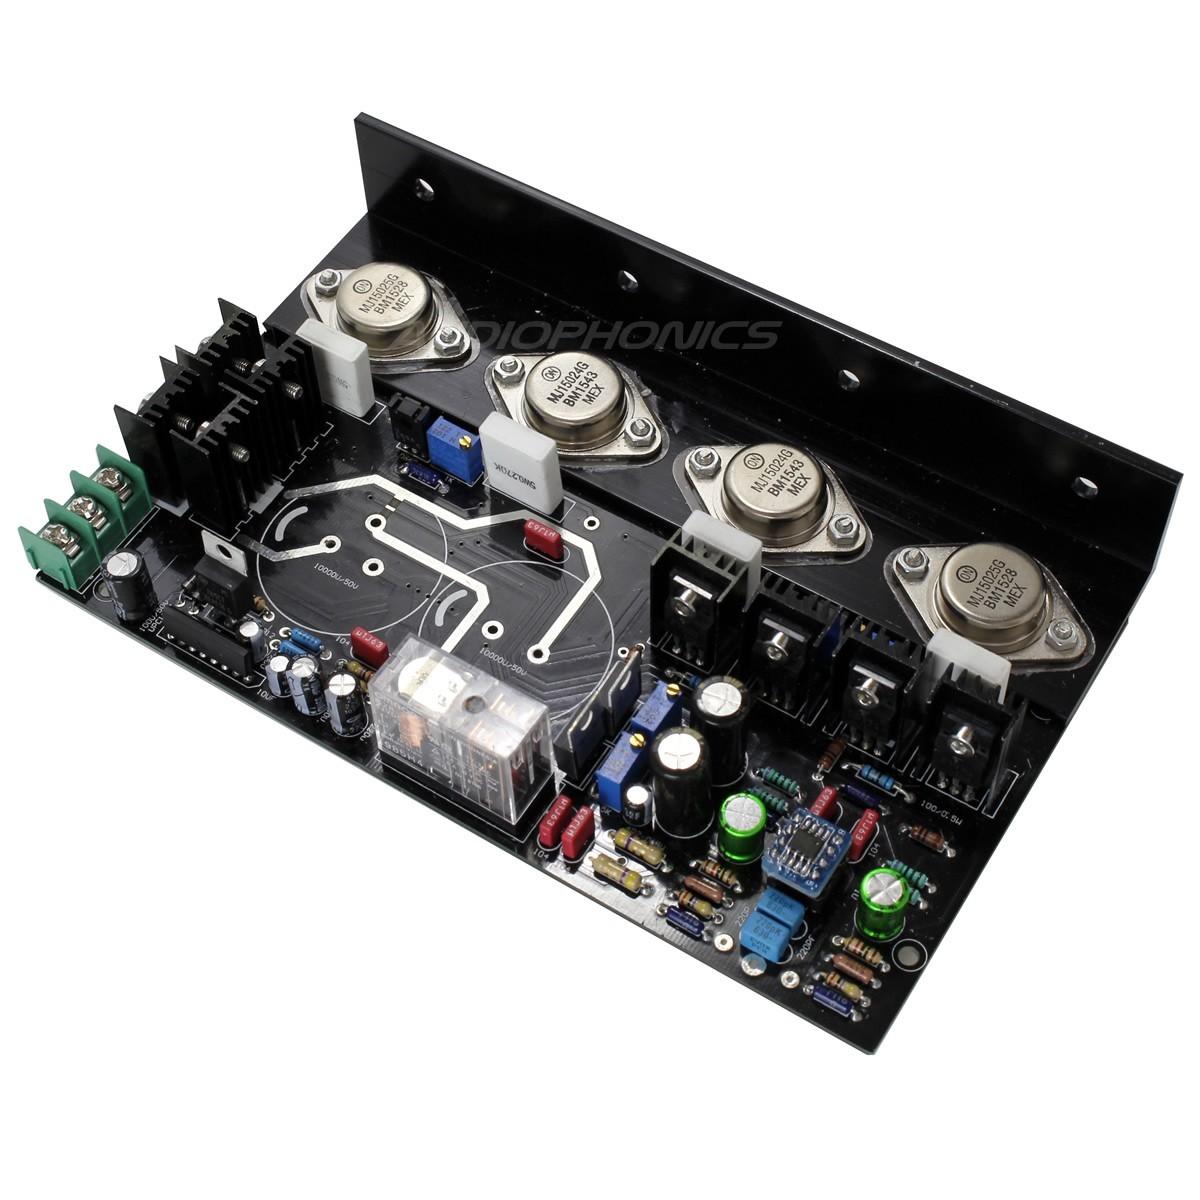 MJ15024 Bipolar 2x35w 8 Ohm Stereo Amplifier Class AB